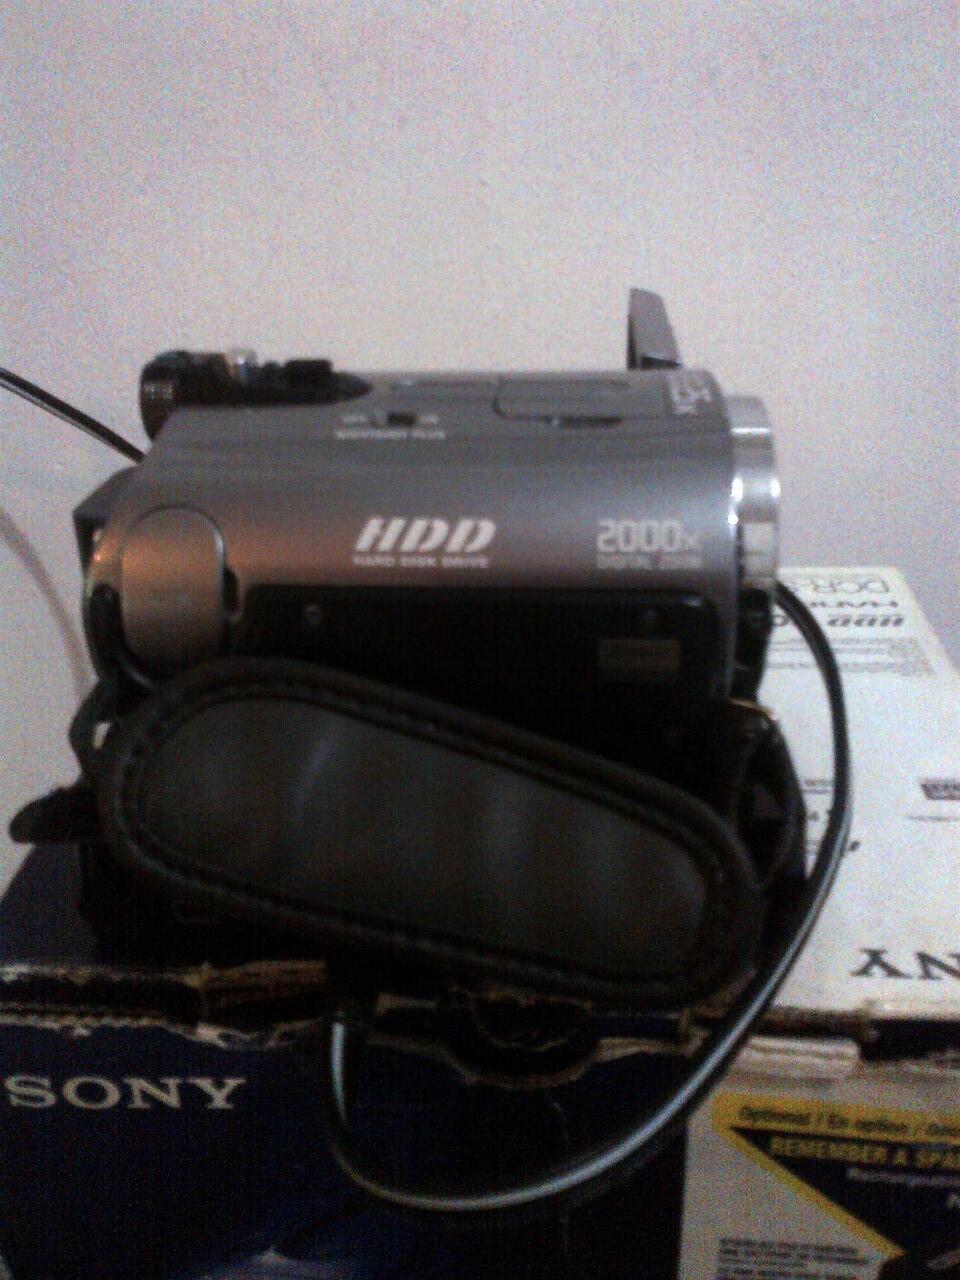 WTS Sony Handycam DCR-SR82E